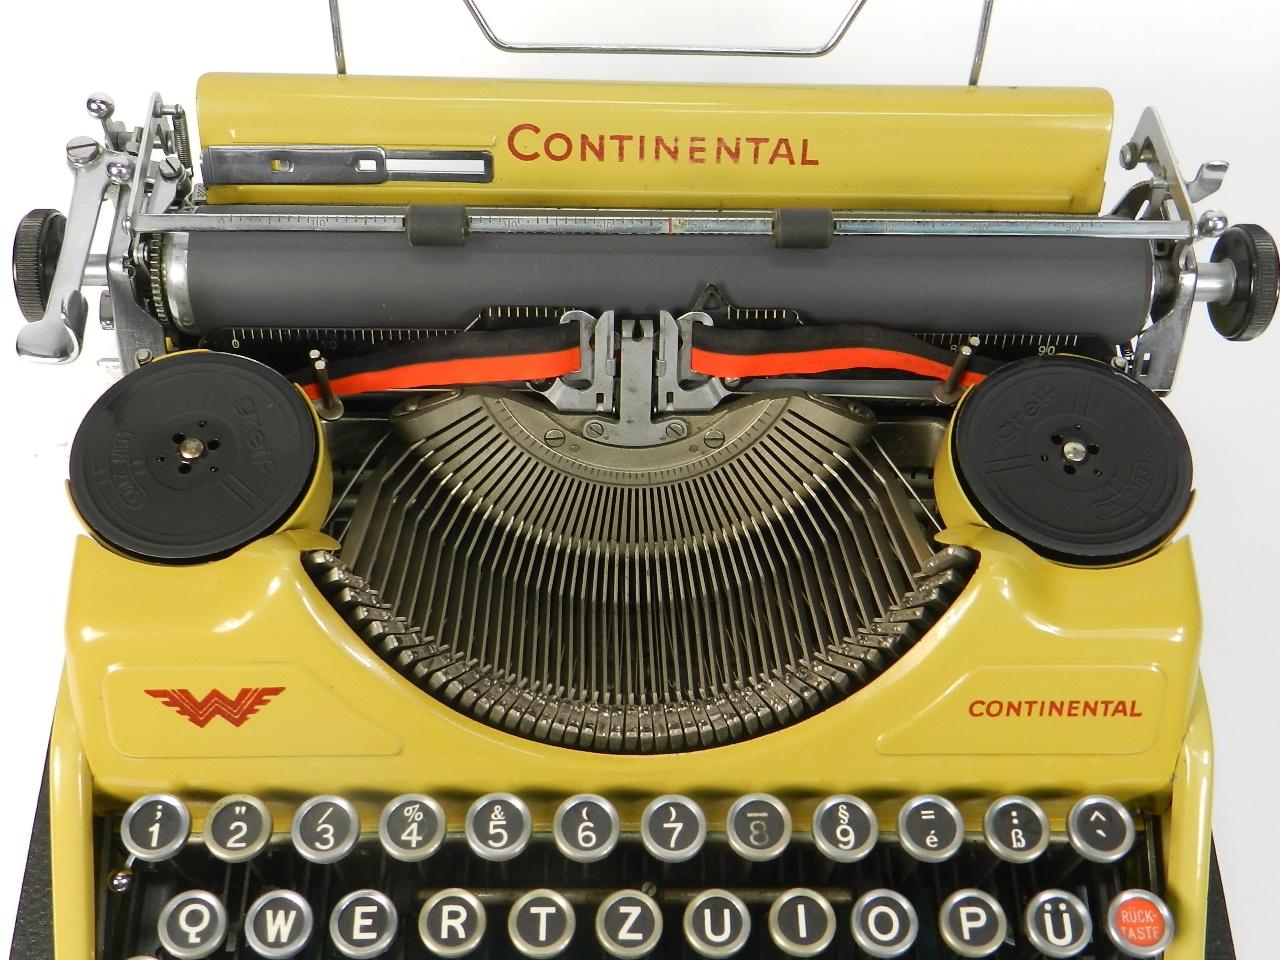 Imagen CONTINENTAL WANDERER MOSTAZA 1932 42048